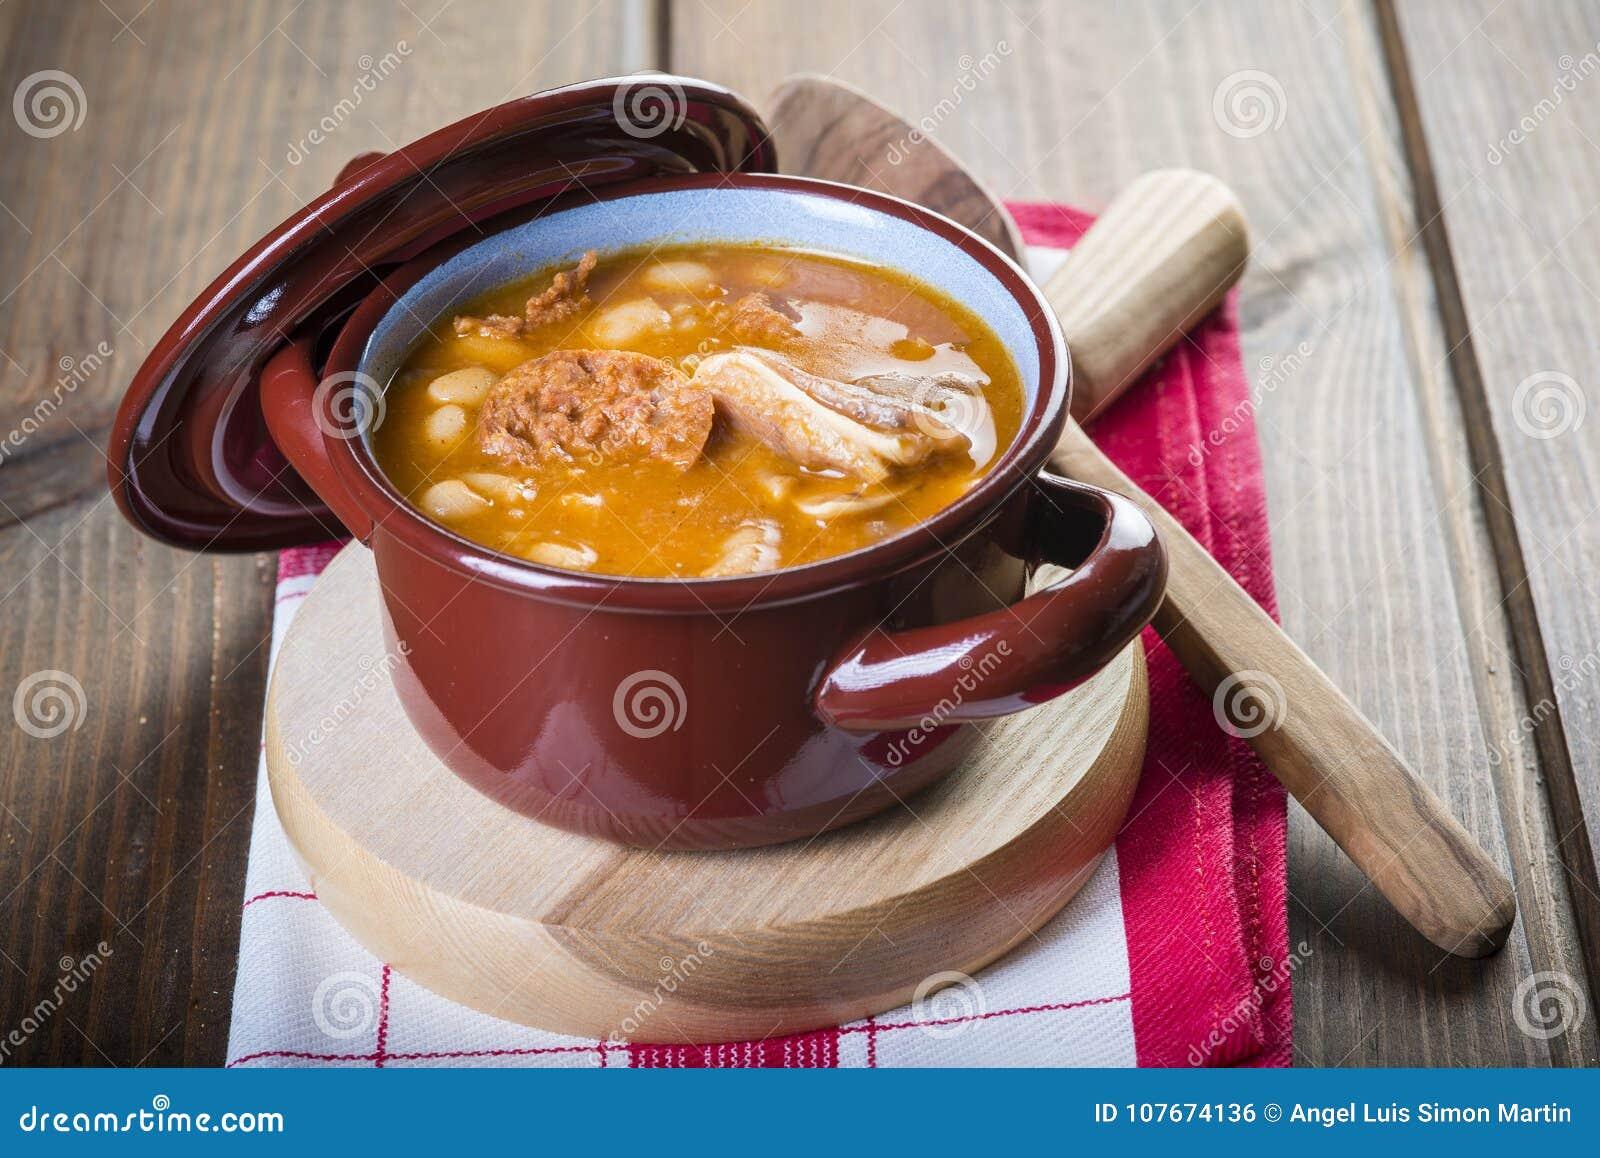 Ragoût de haricots blancs et de viande de porc